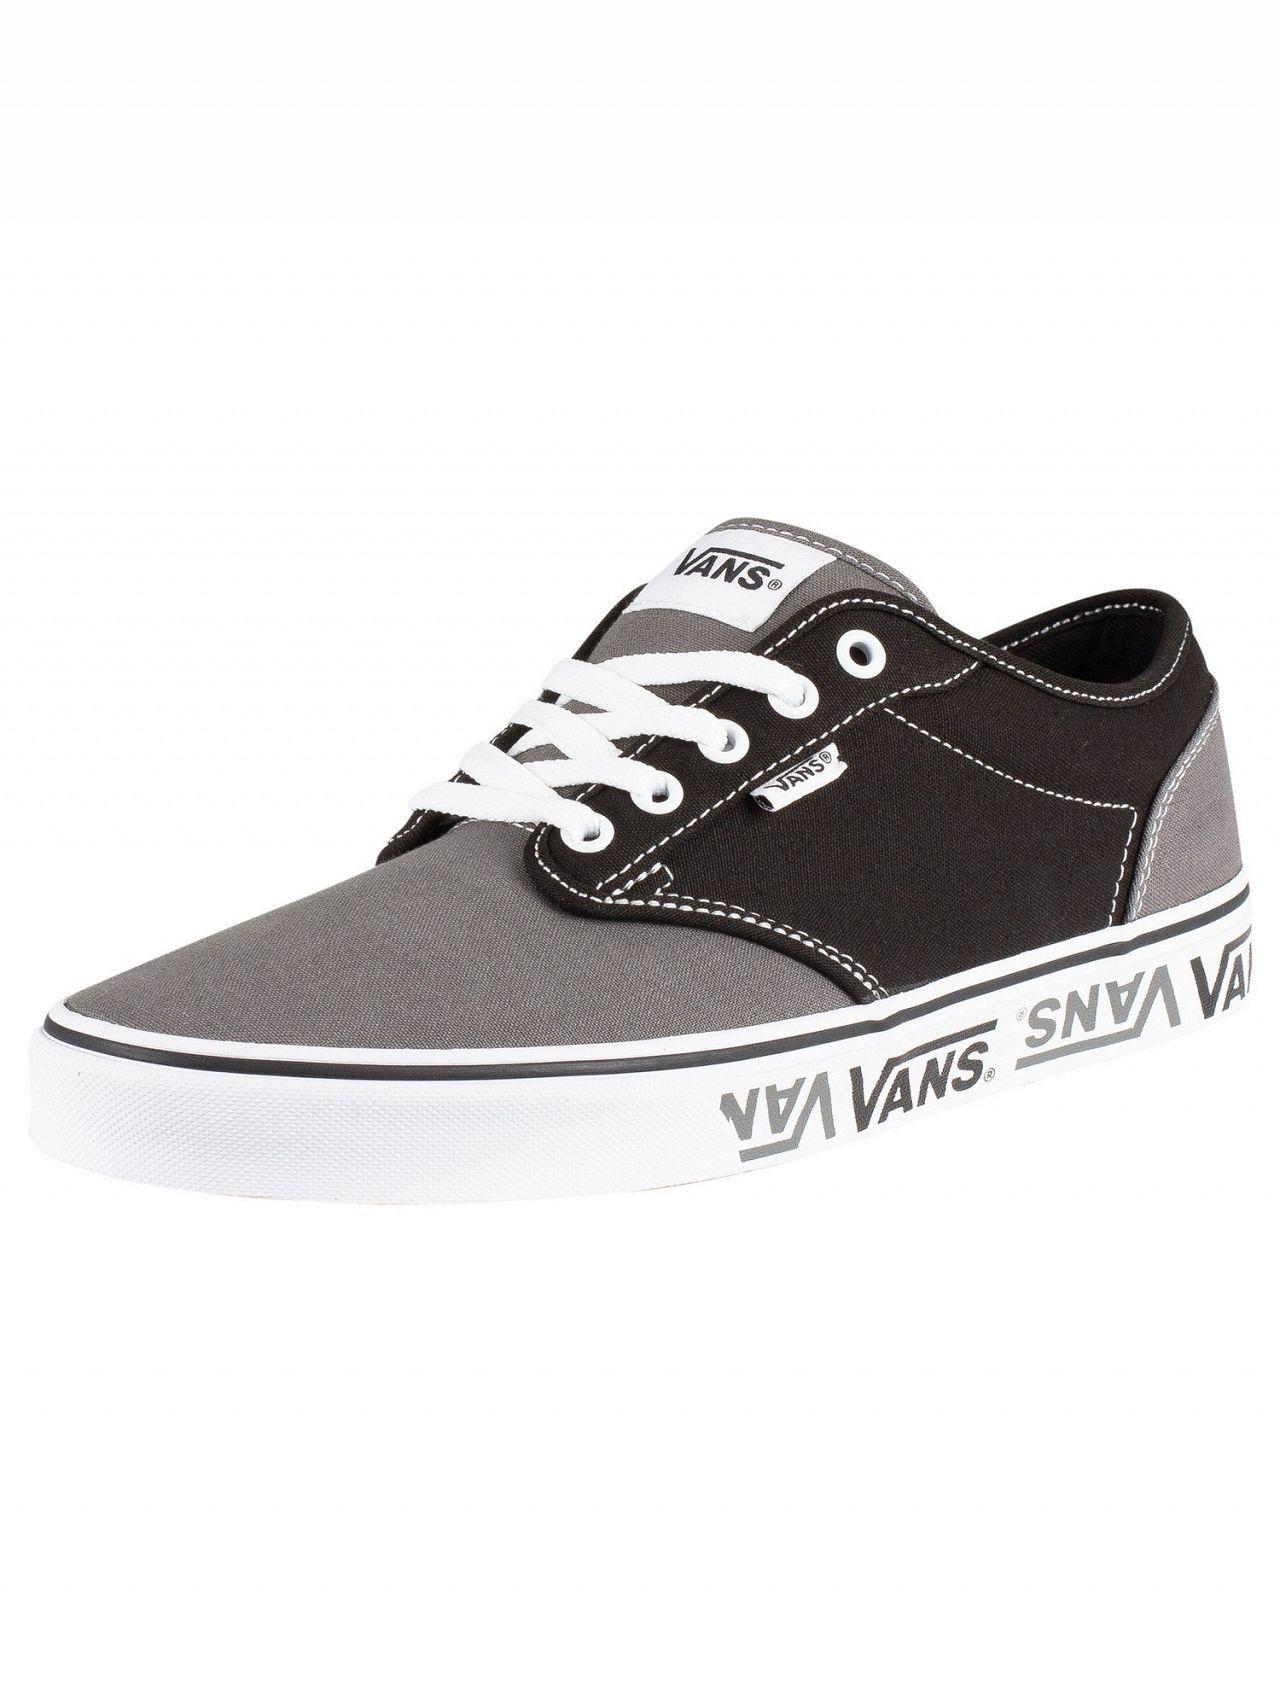 9fab4634cb Vans - Black grey Atwood Sidewall Logo Trainers for Men - Lyst. View  fullscreen